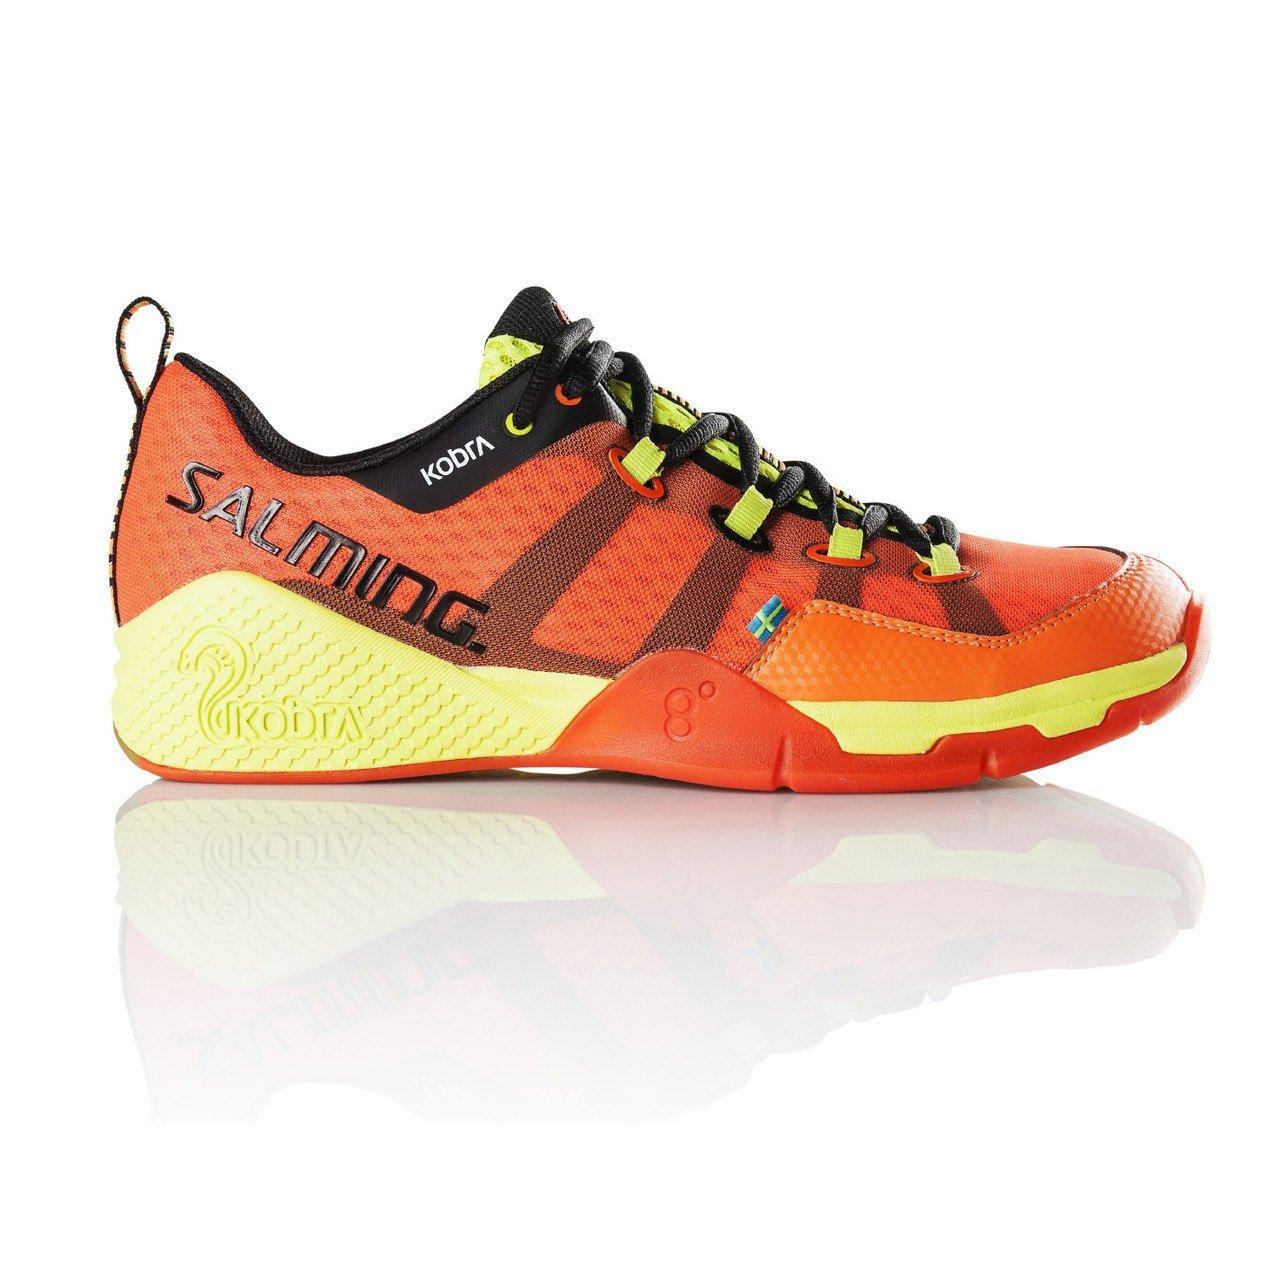 Salming Kobra Mens Squash Shoes (12.5, Magma Red/Black)